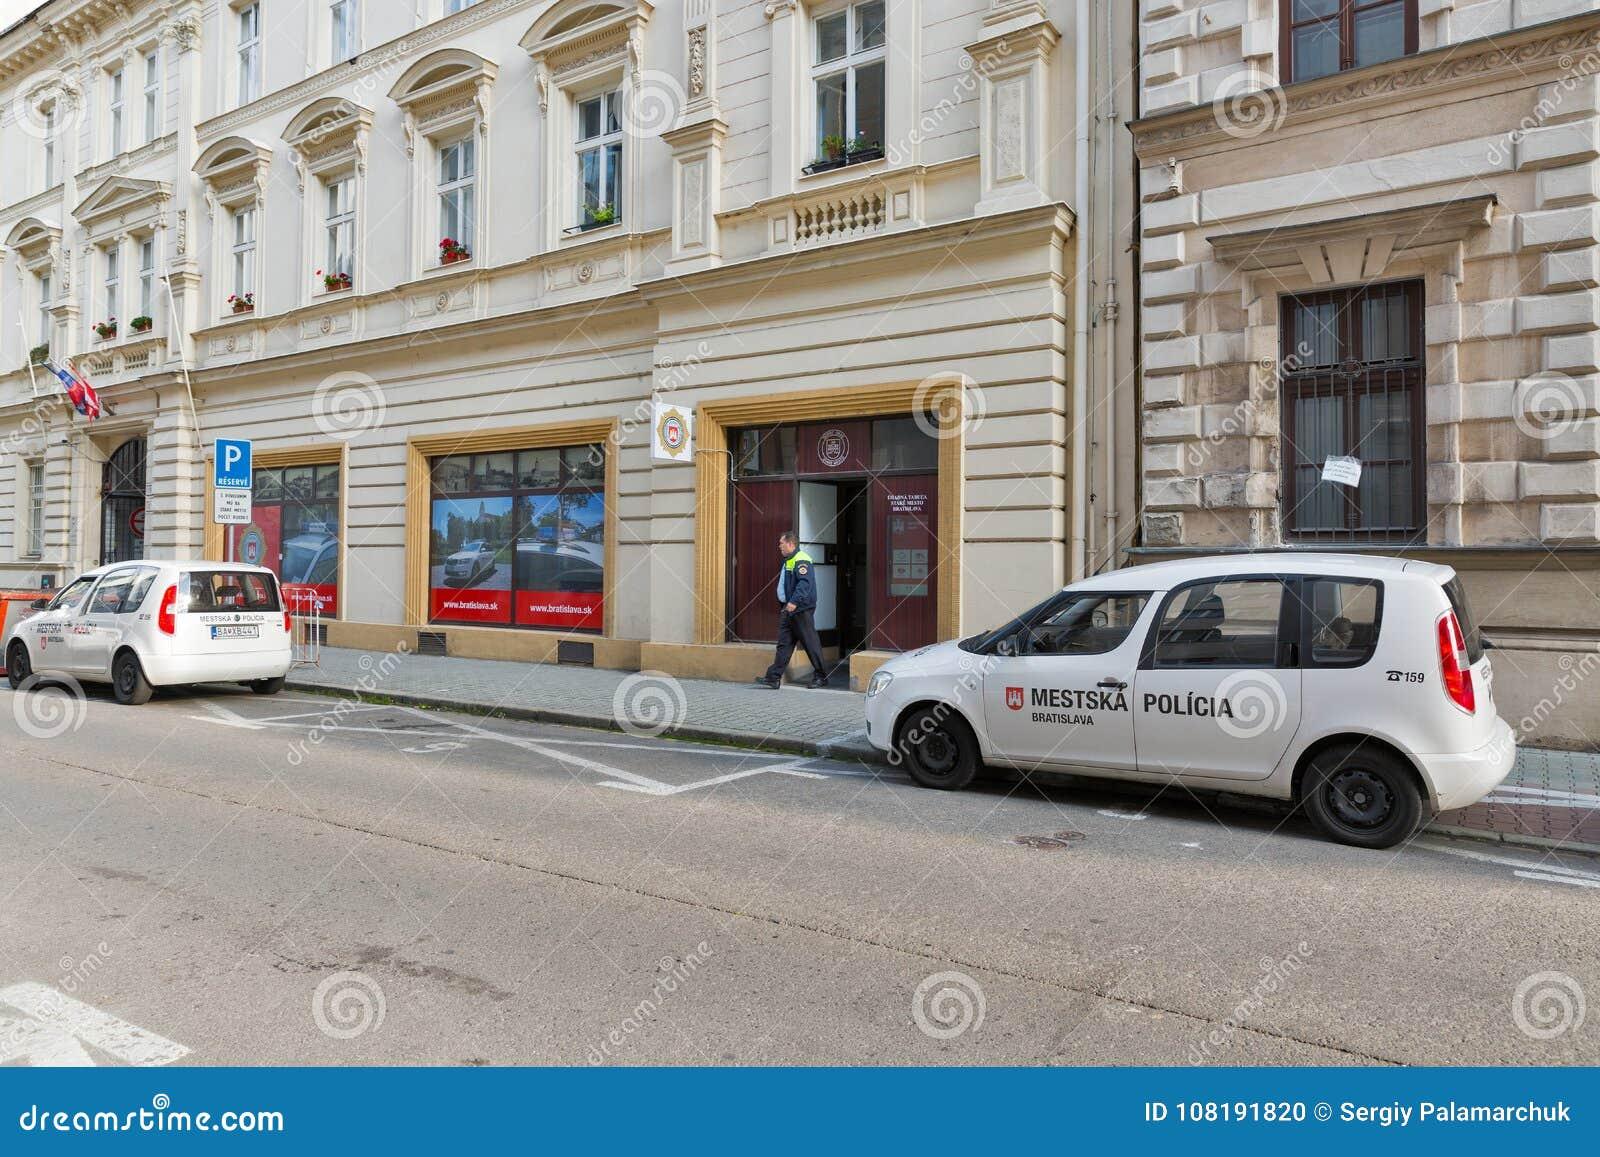 Police Department In Bratislava, Slovakia  Editorial Image